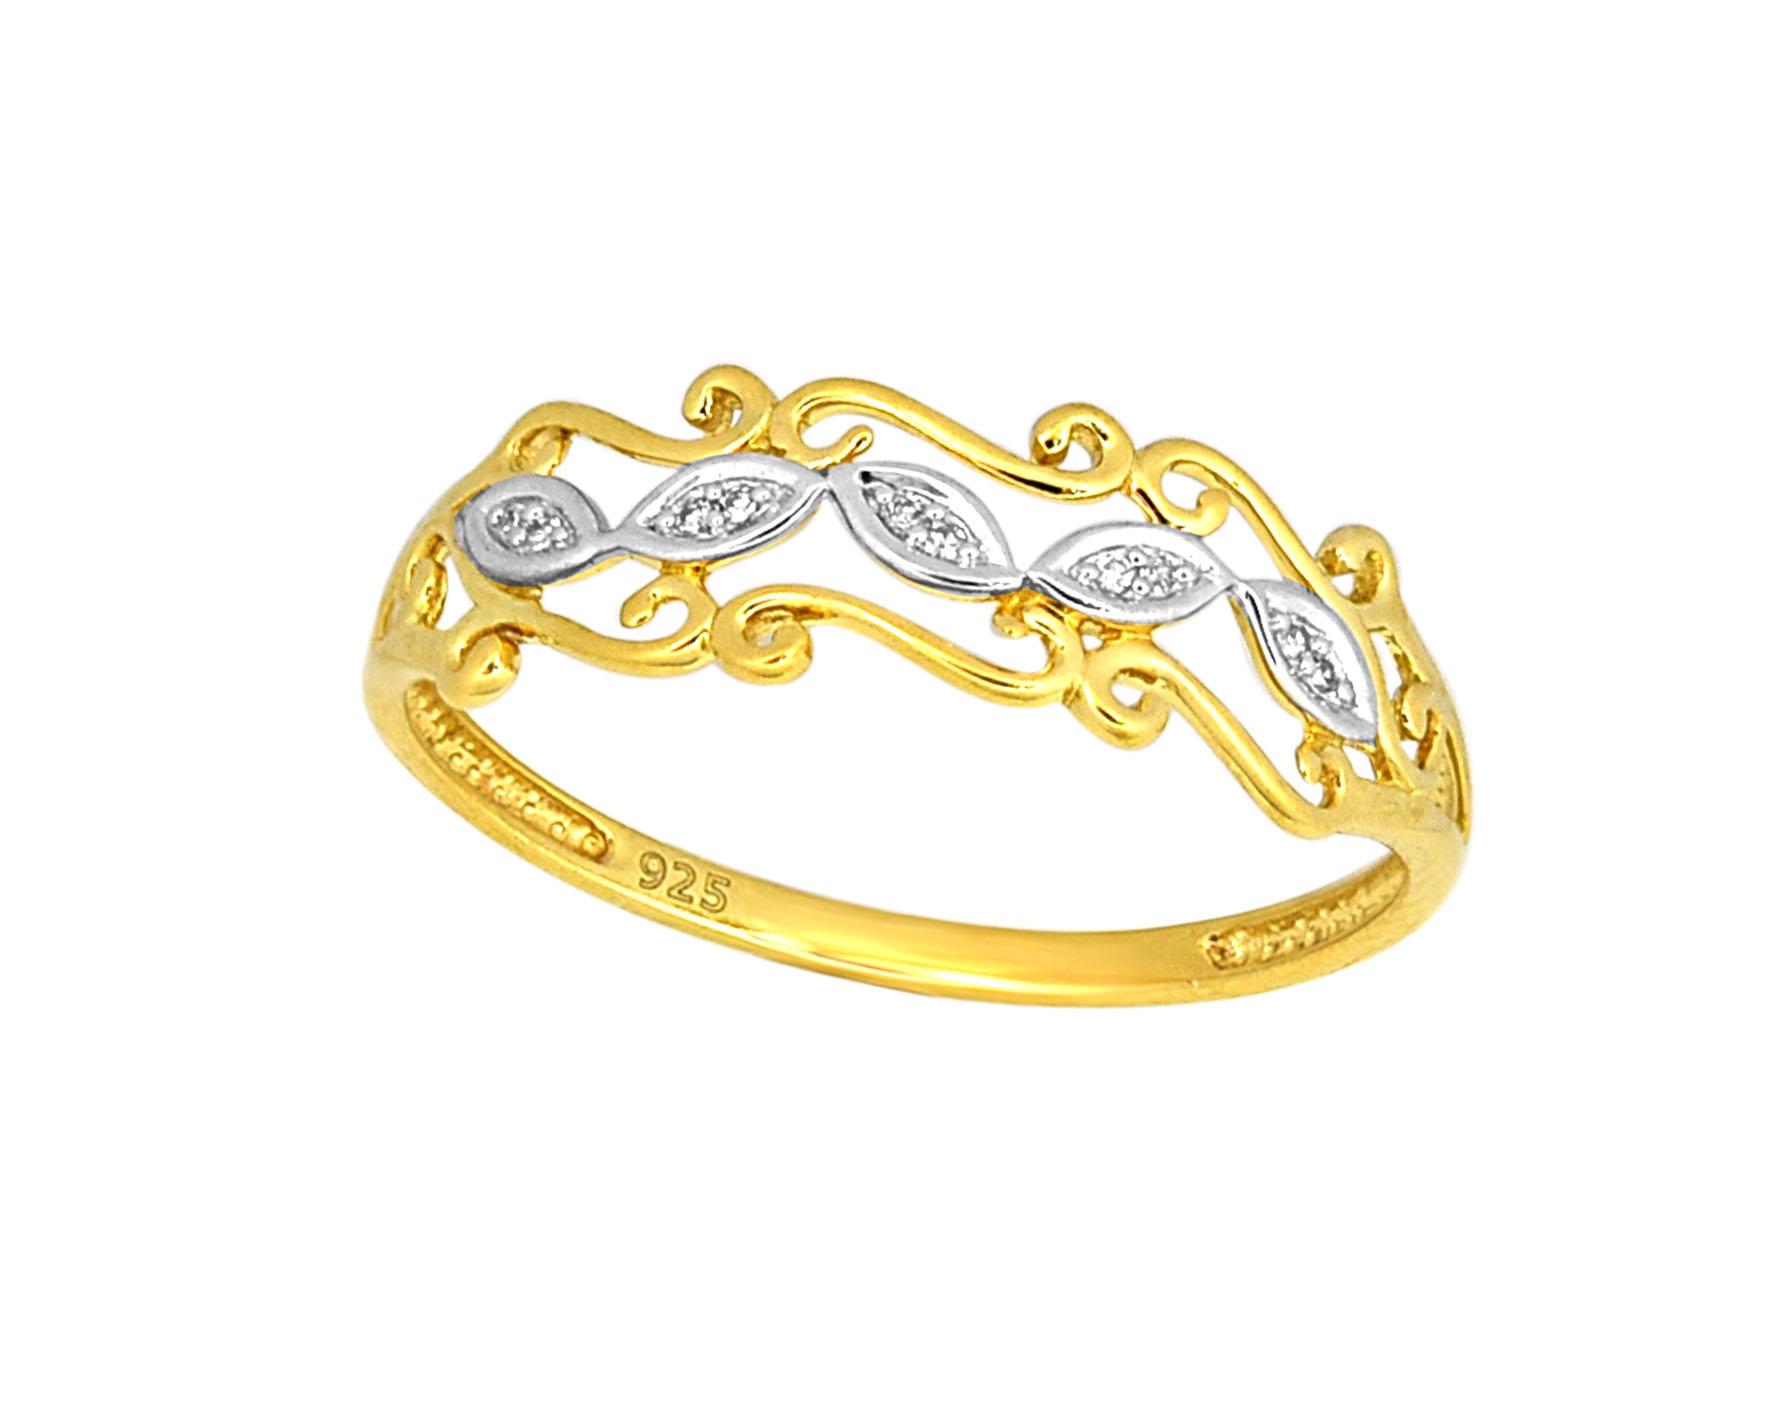 9ct Yellow Gold Diamond Ring with 10 Brilliant Diamonds